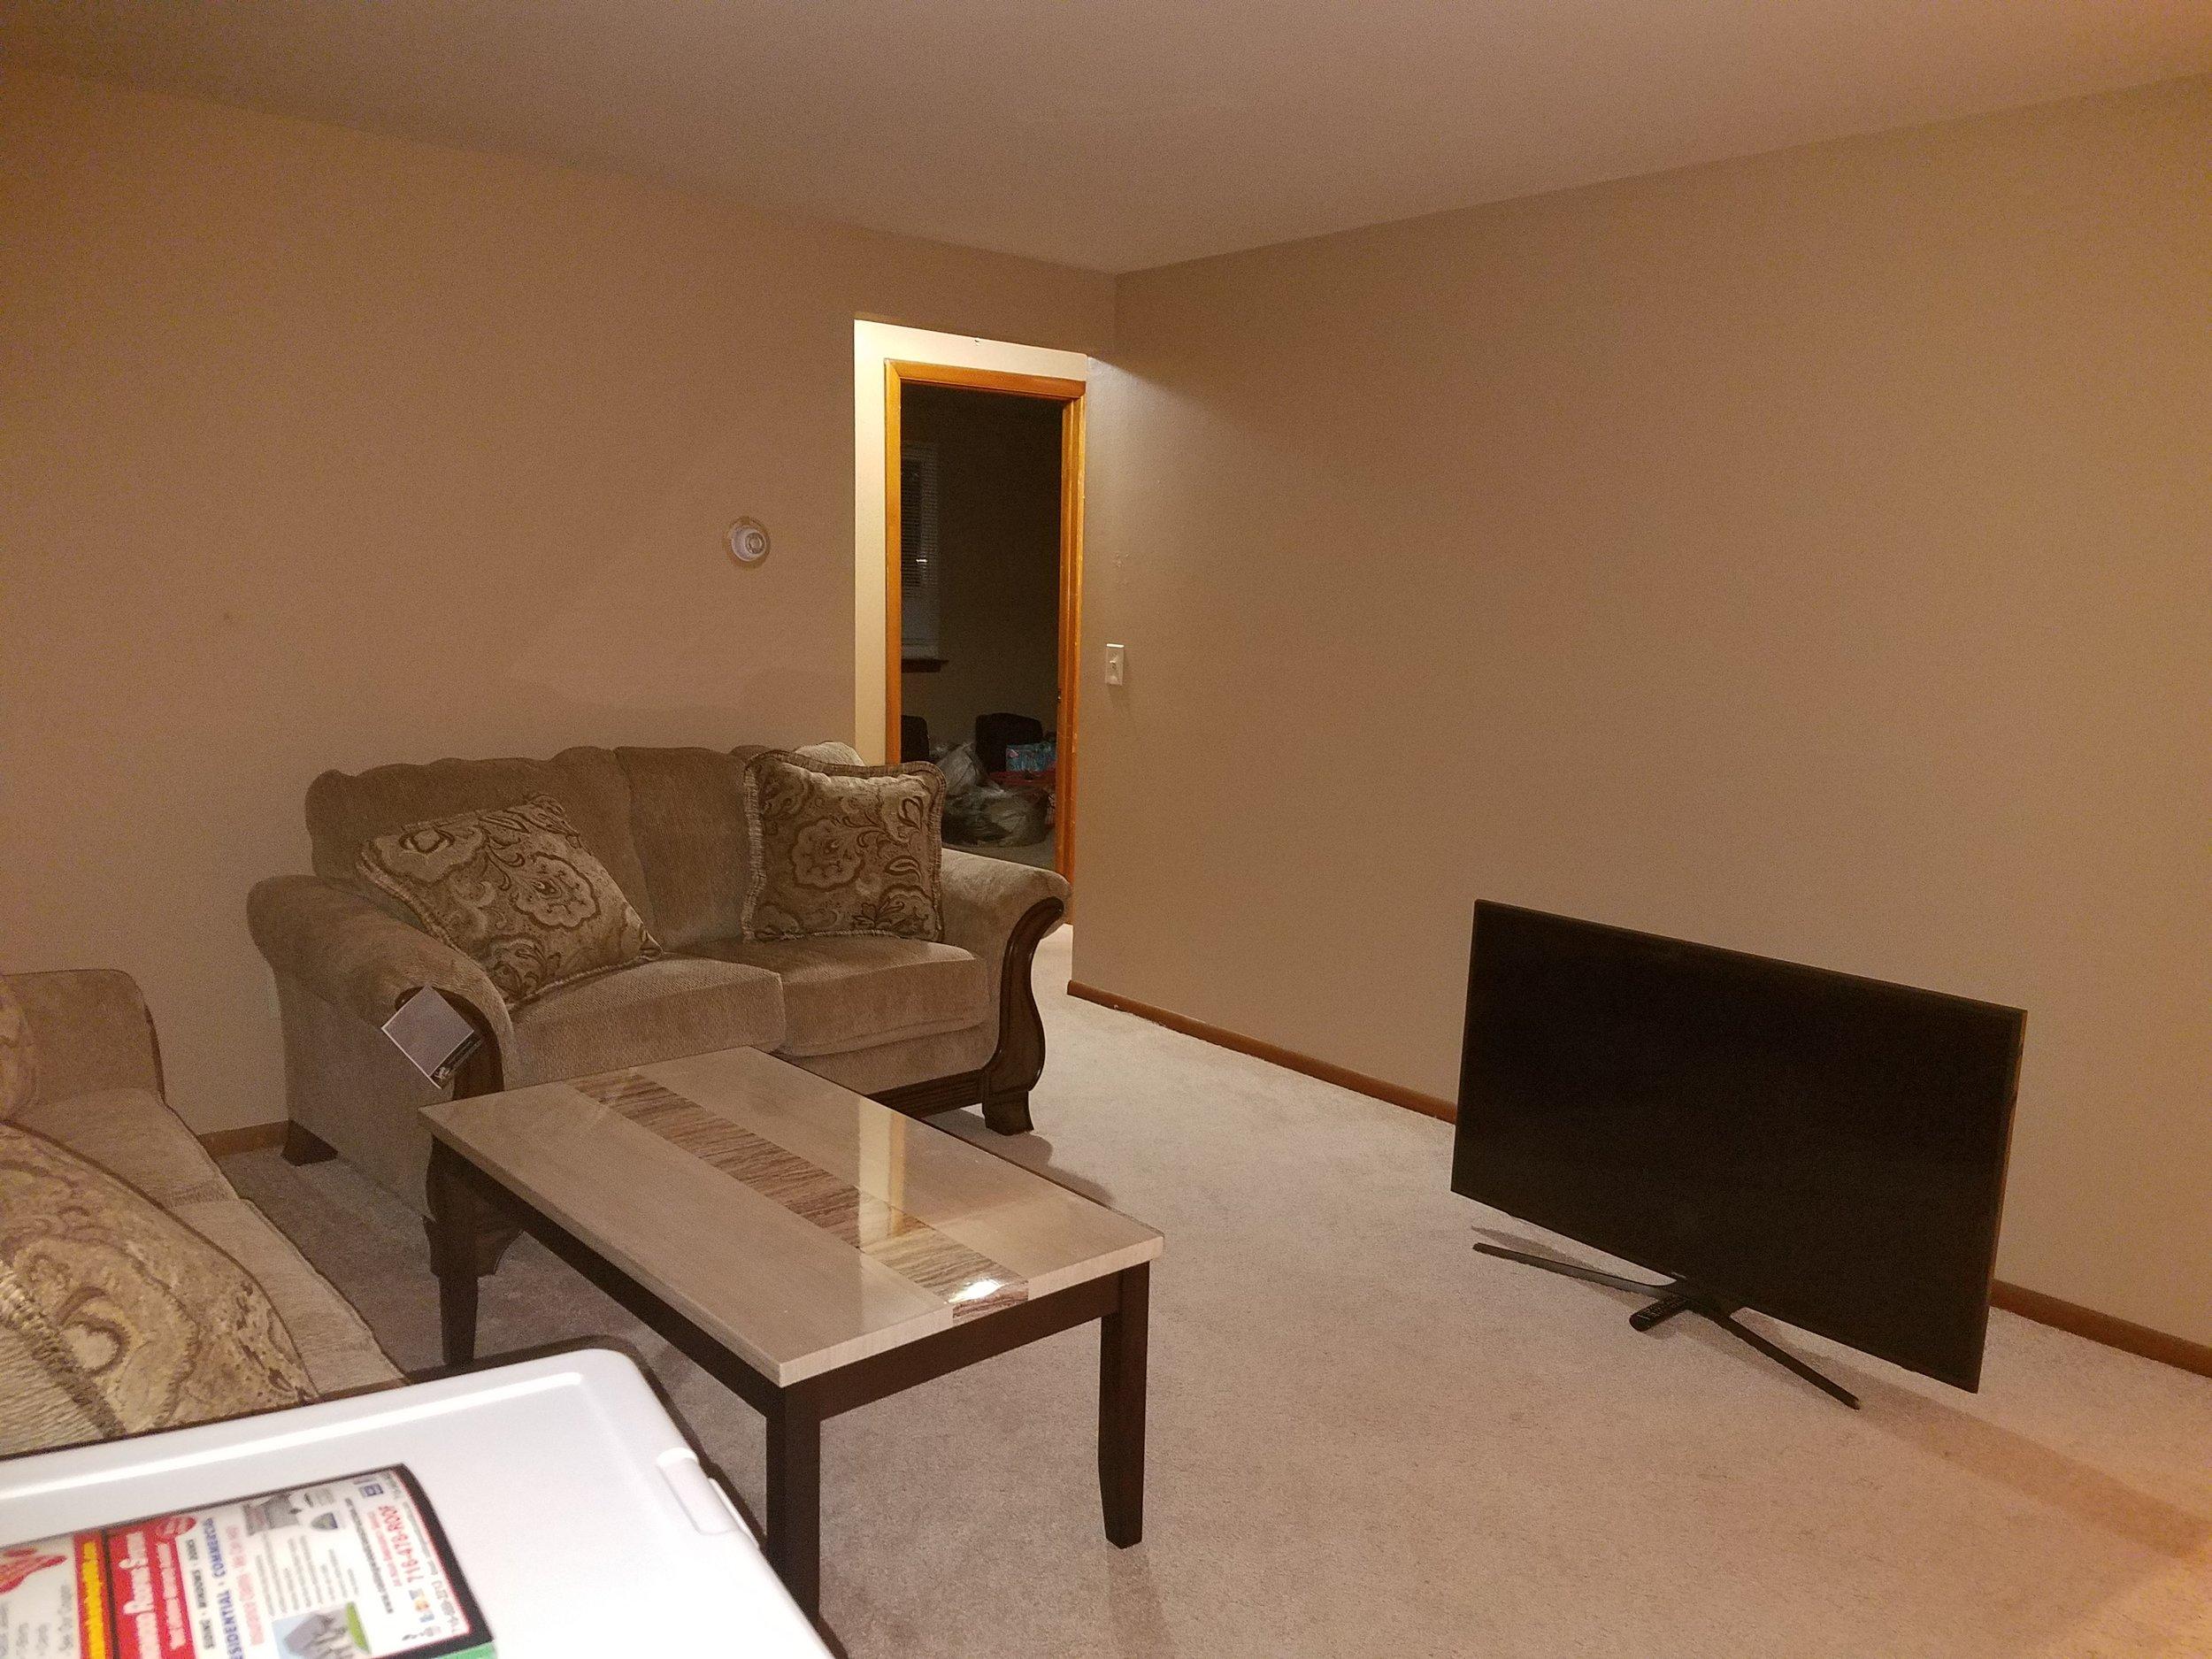 Livingroom before 2.jpg